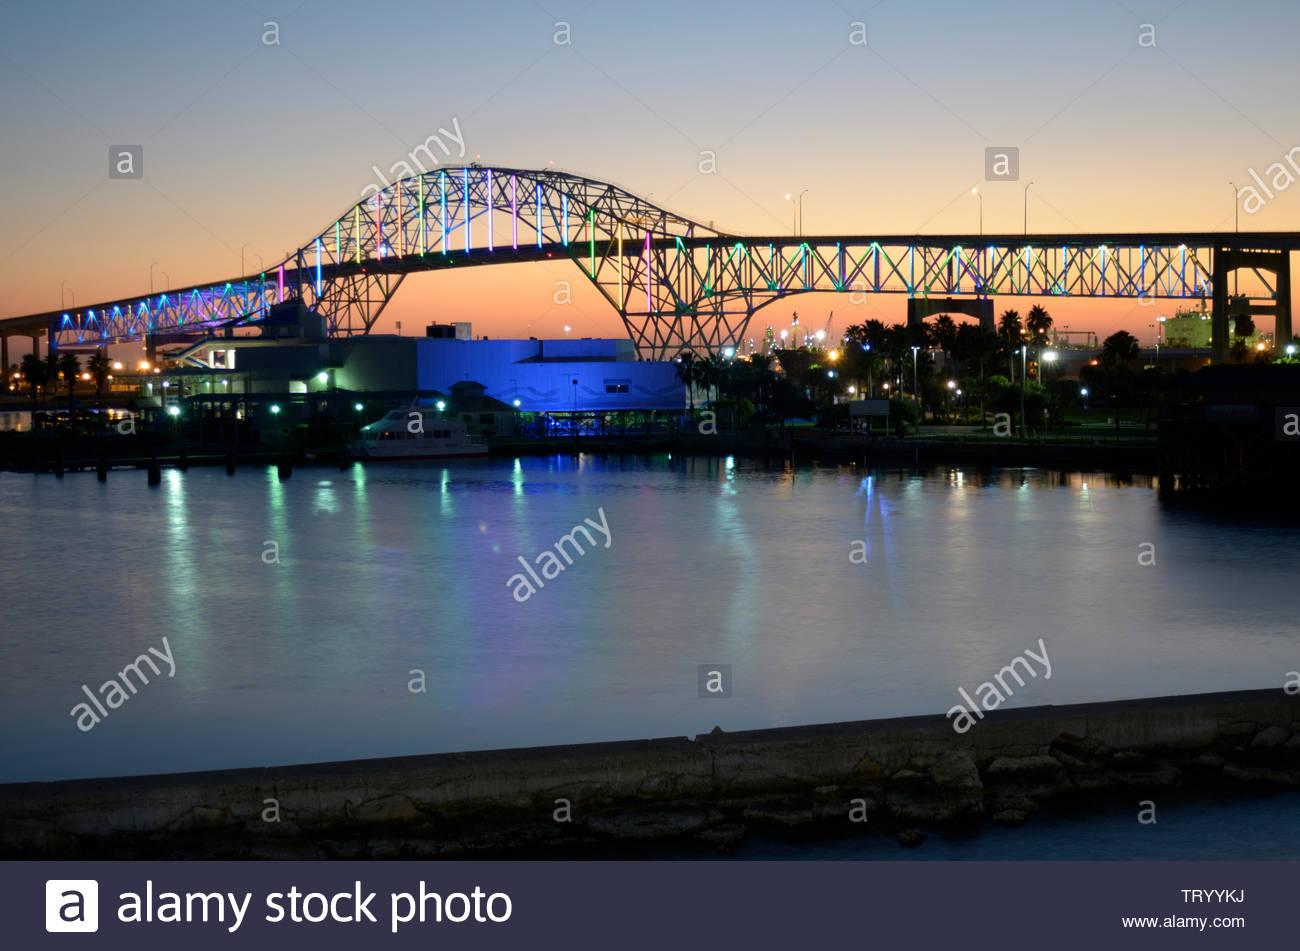 Corpus Christi Harbor Bridge at Night. US 181 Corpus Christi Harbor Bridge Lit up. Corpus Christi Shipping Channel. Texas Gulf Coast. Corpus Christi - Stock Image